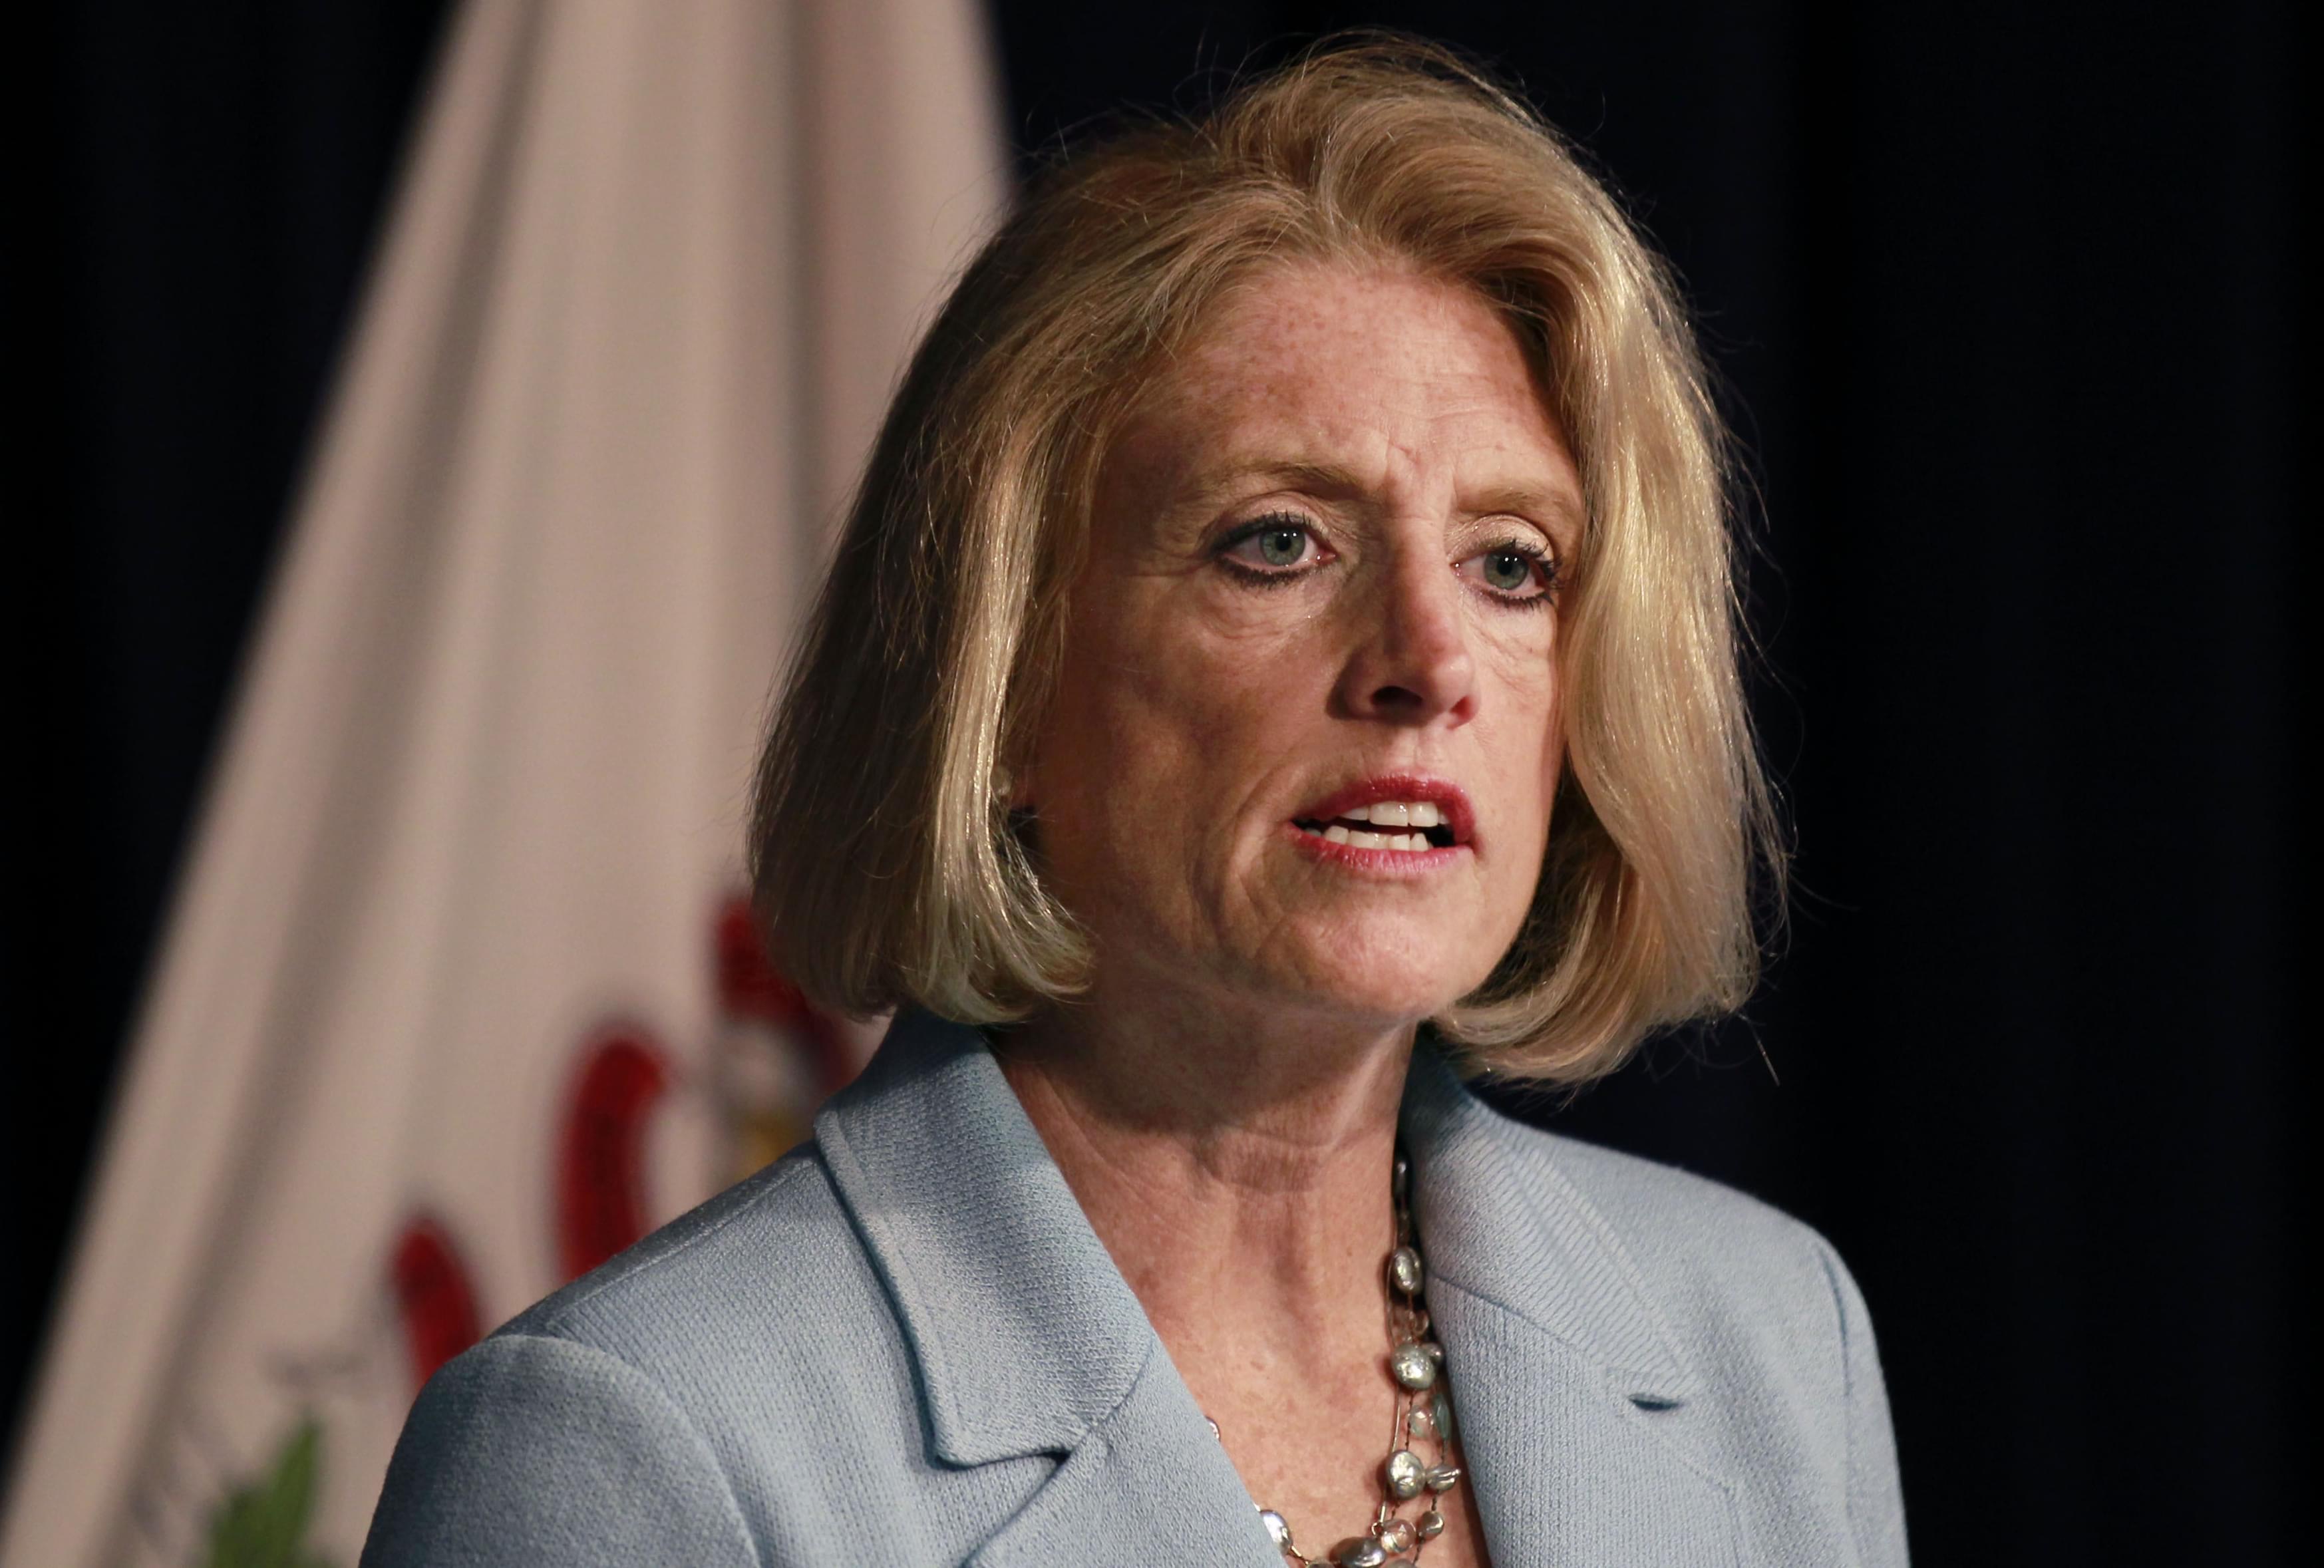 Comptroller Leslie Munger speaks during a news conference, Wednesday in Chicago.